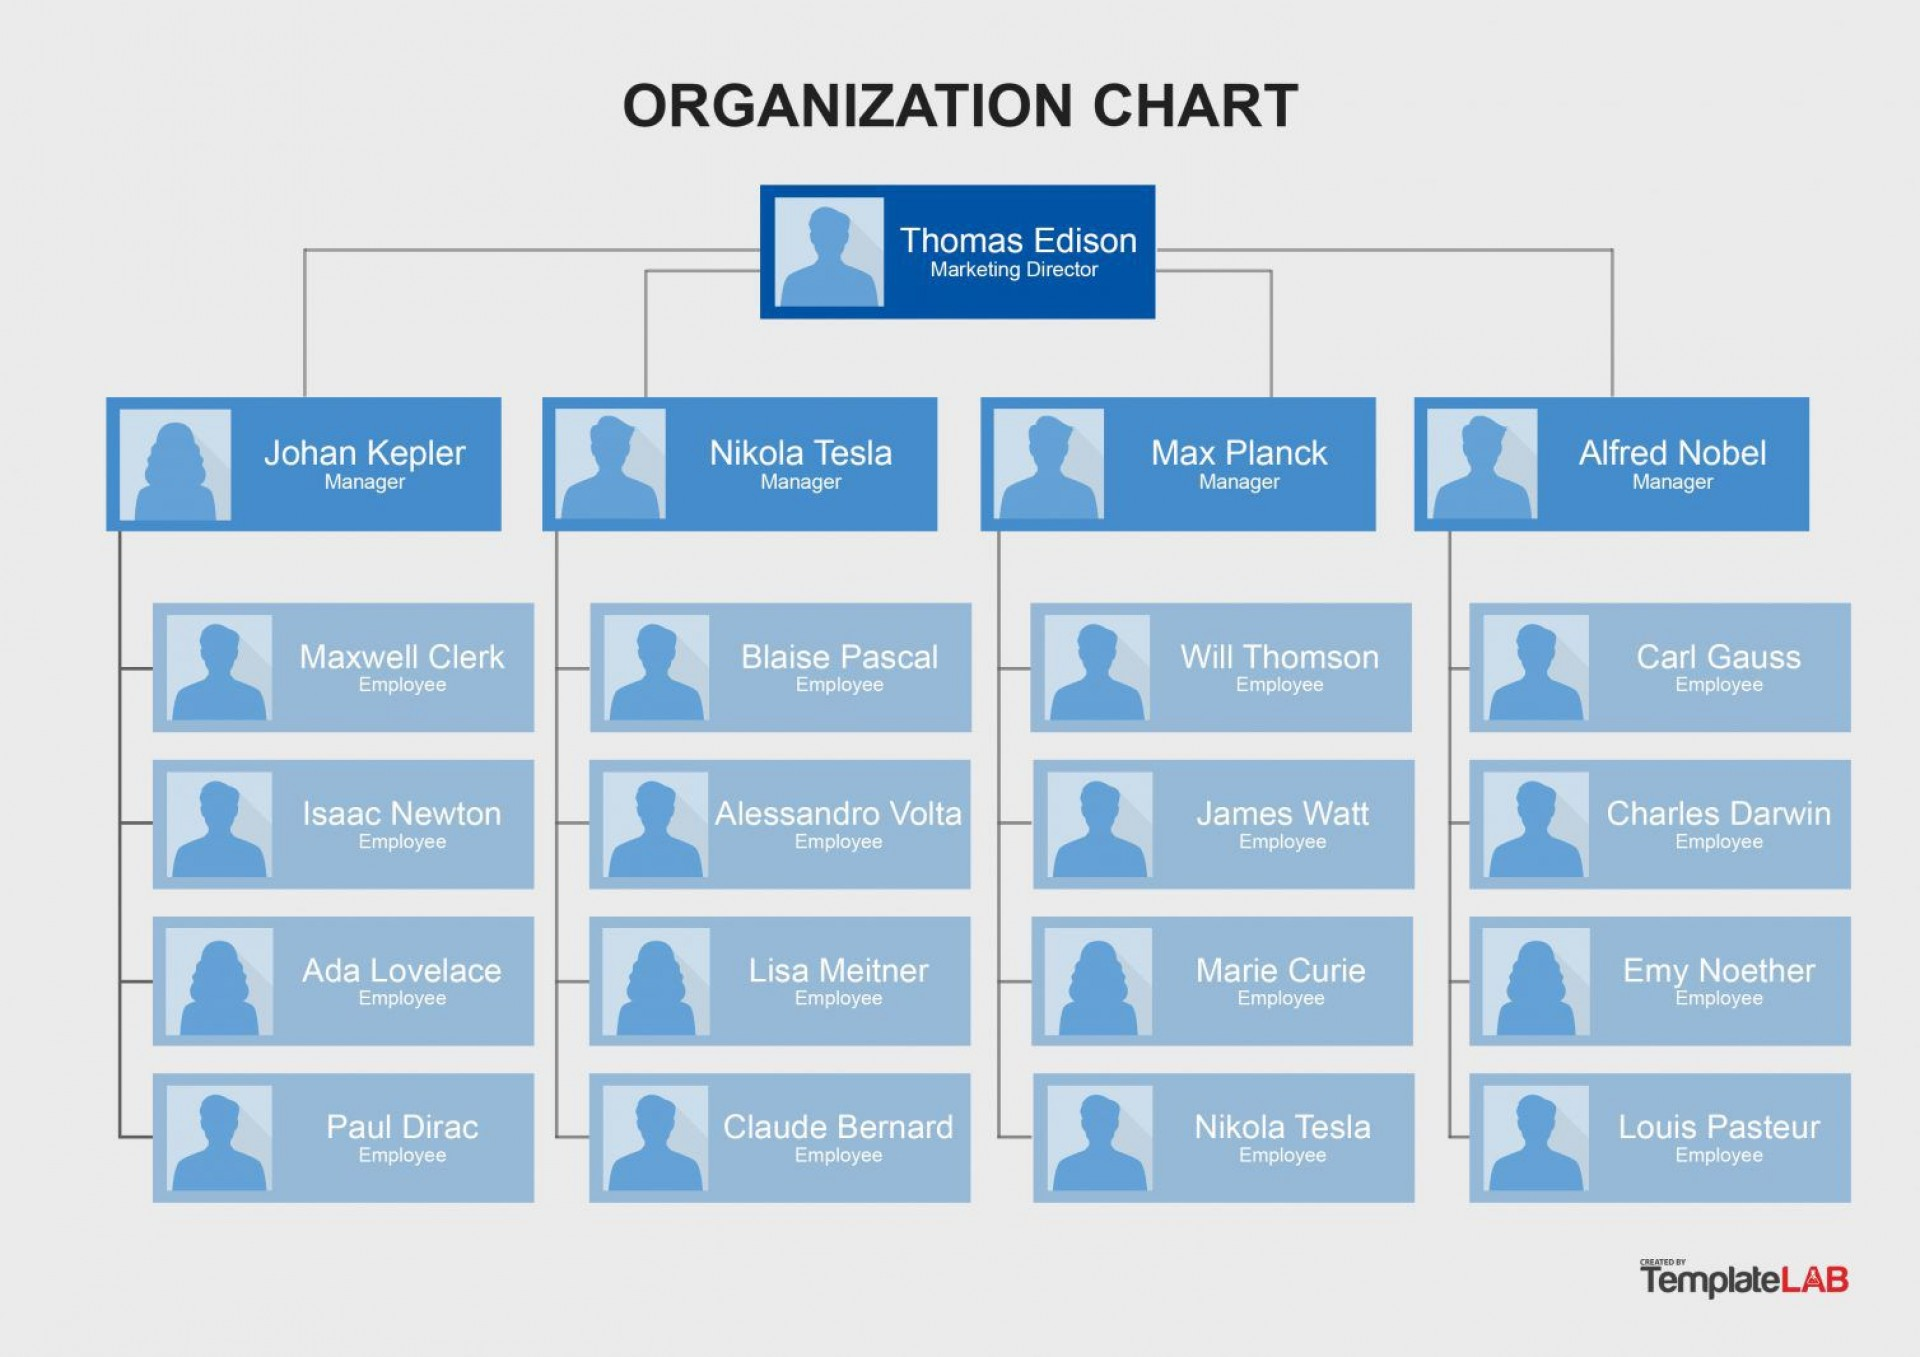 008 Dreaded Microsoft Office Organizational Chart Template 2010 High Def 1920